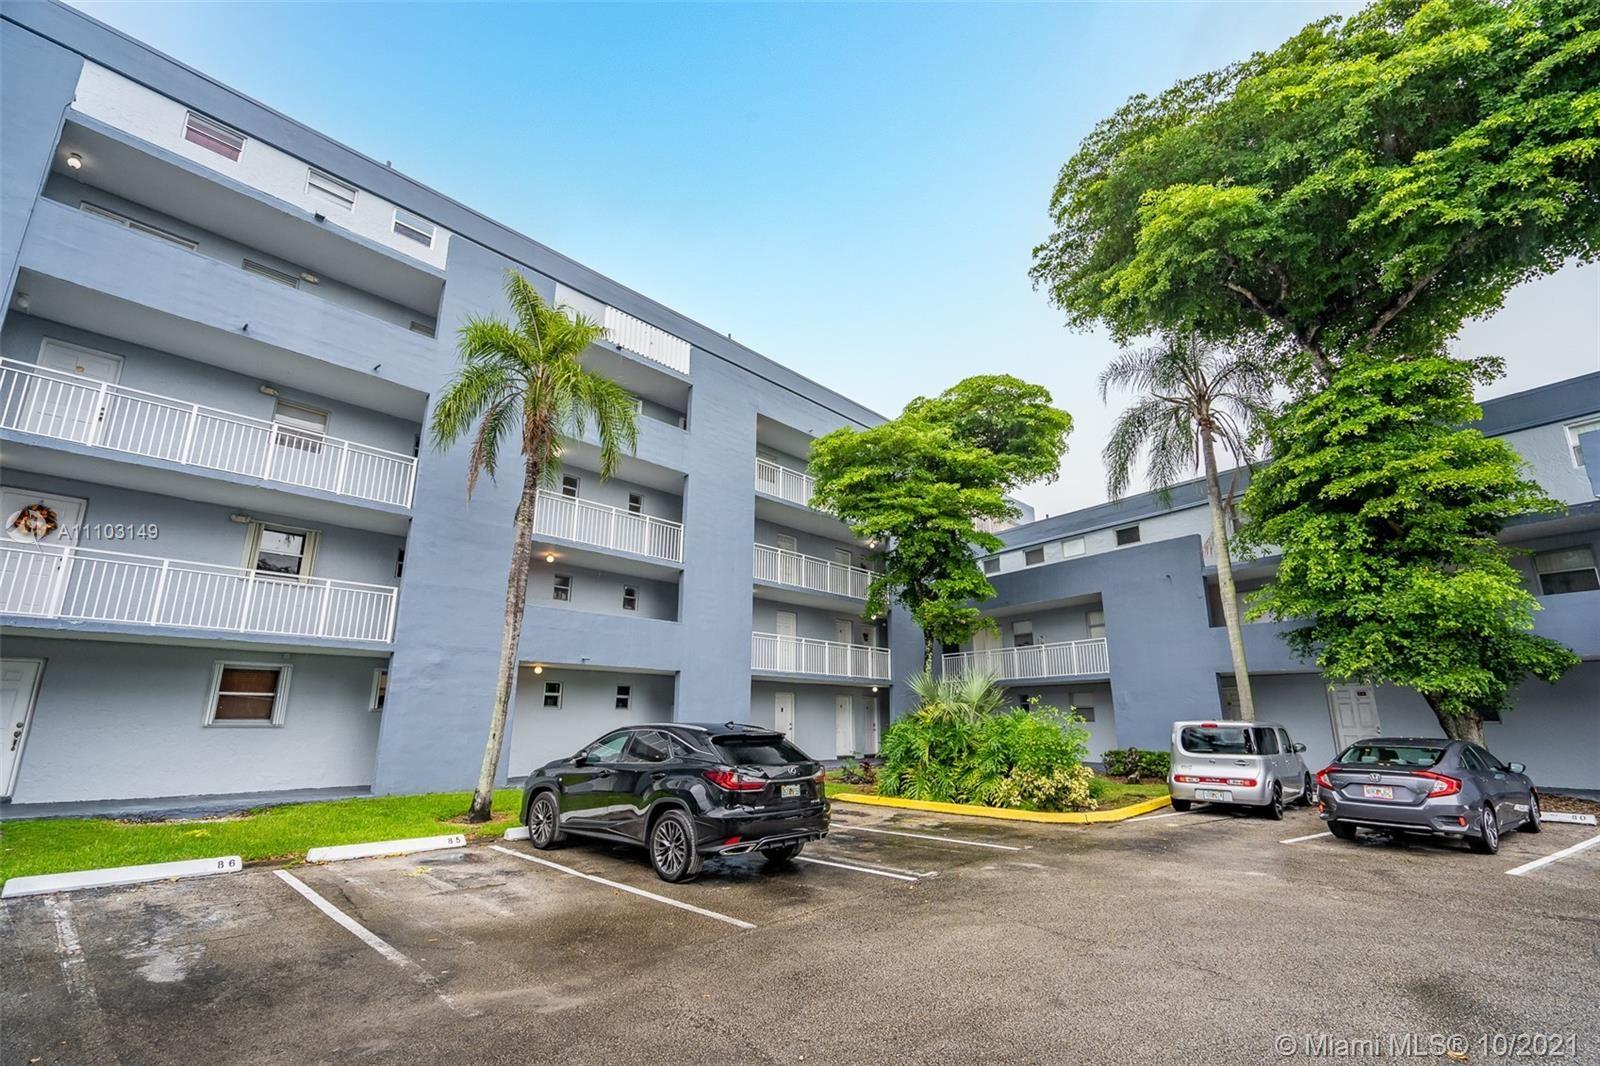 9351 Fontainebleau Blvd #B312, Miami, FL 33172 - #: A11103149